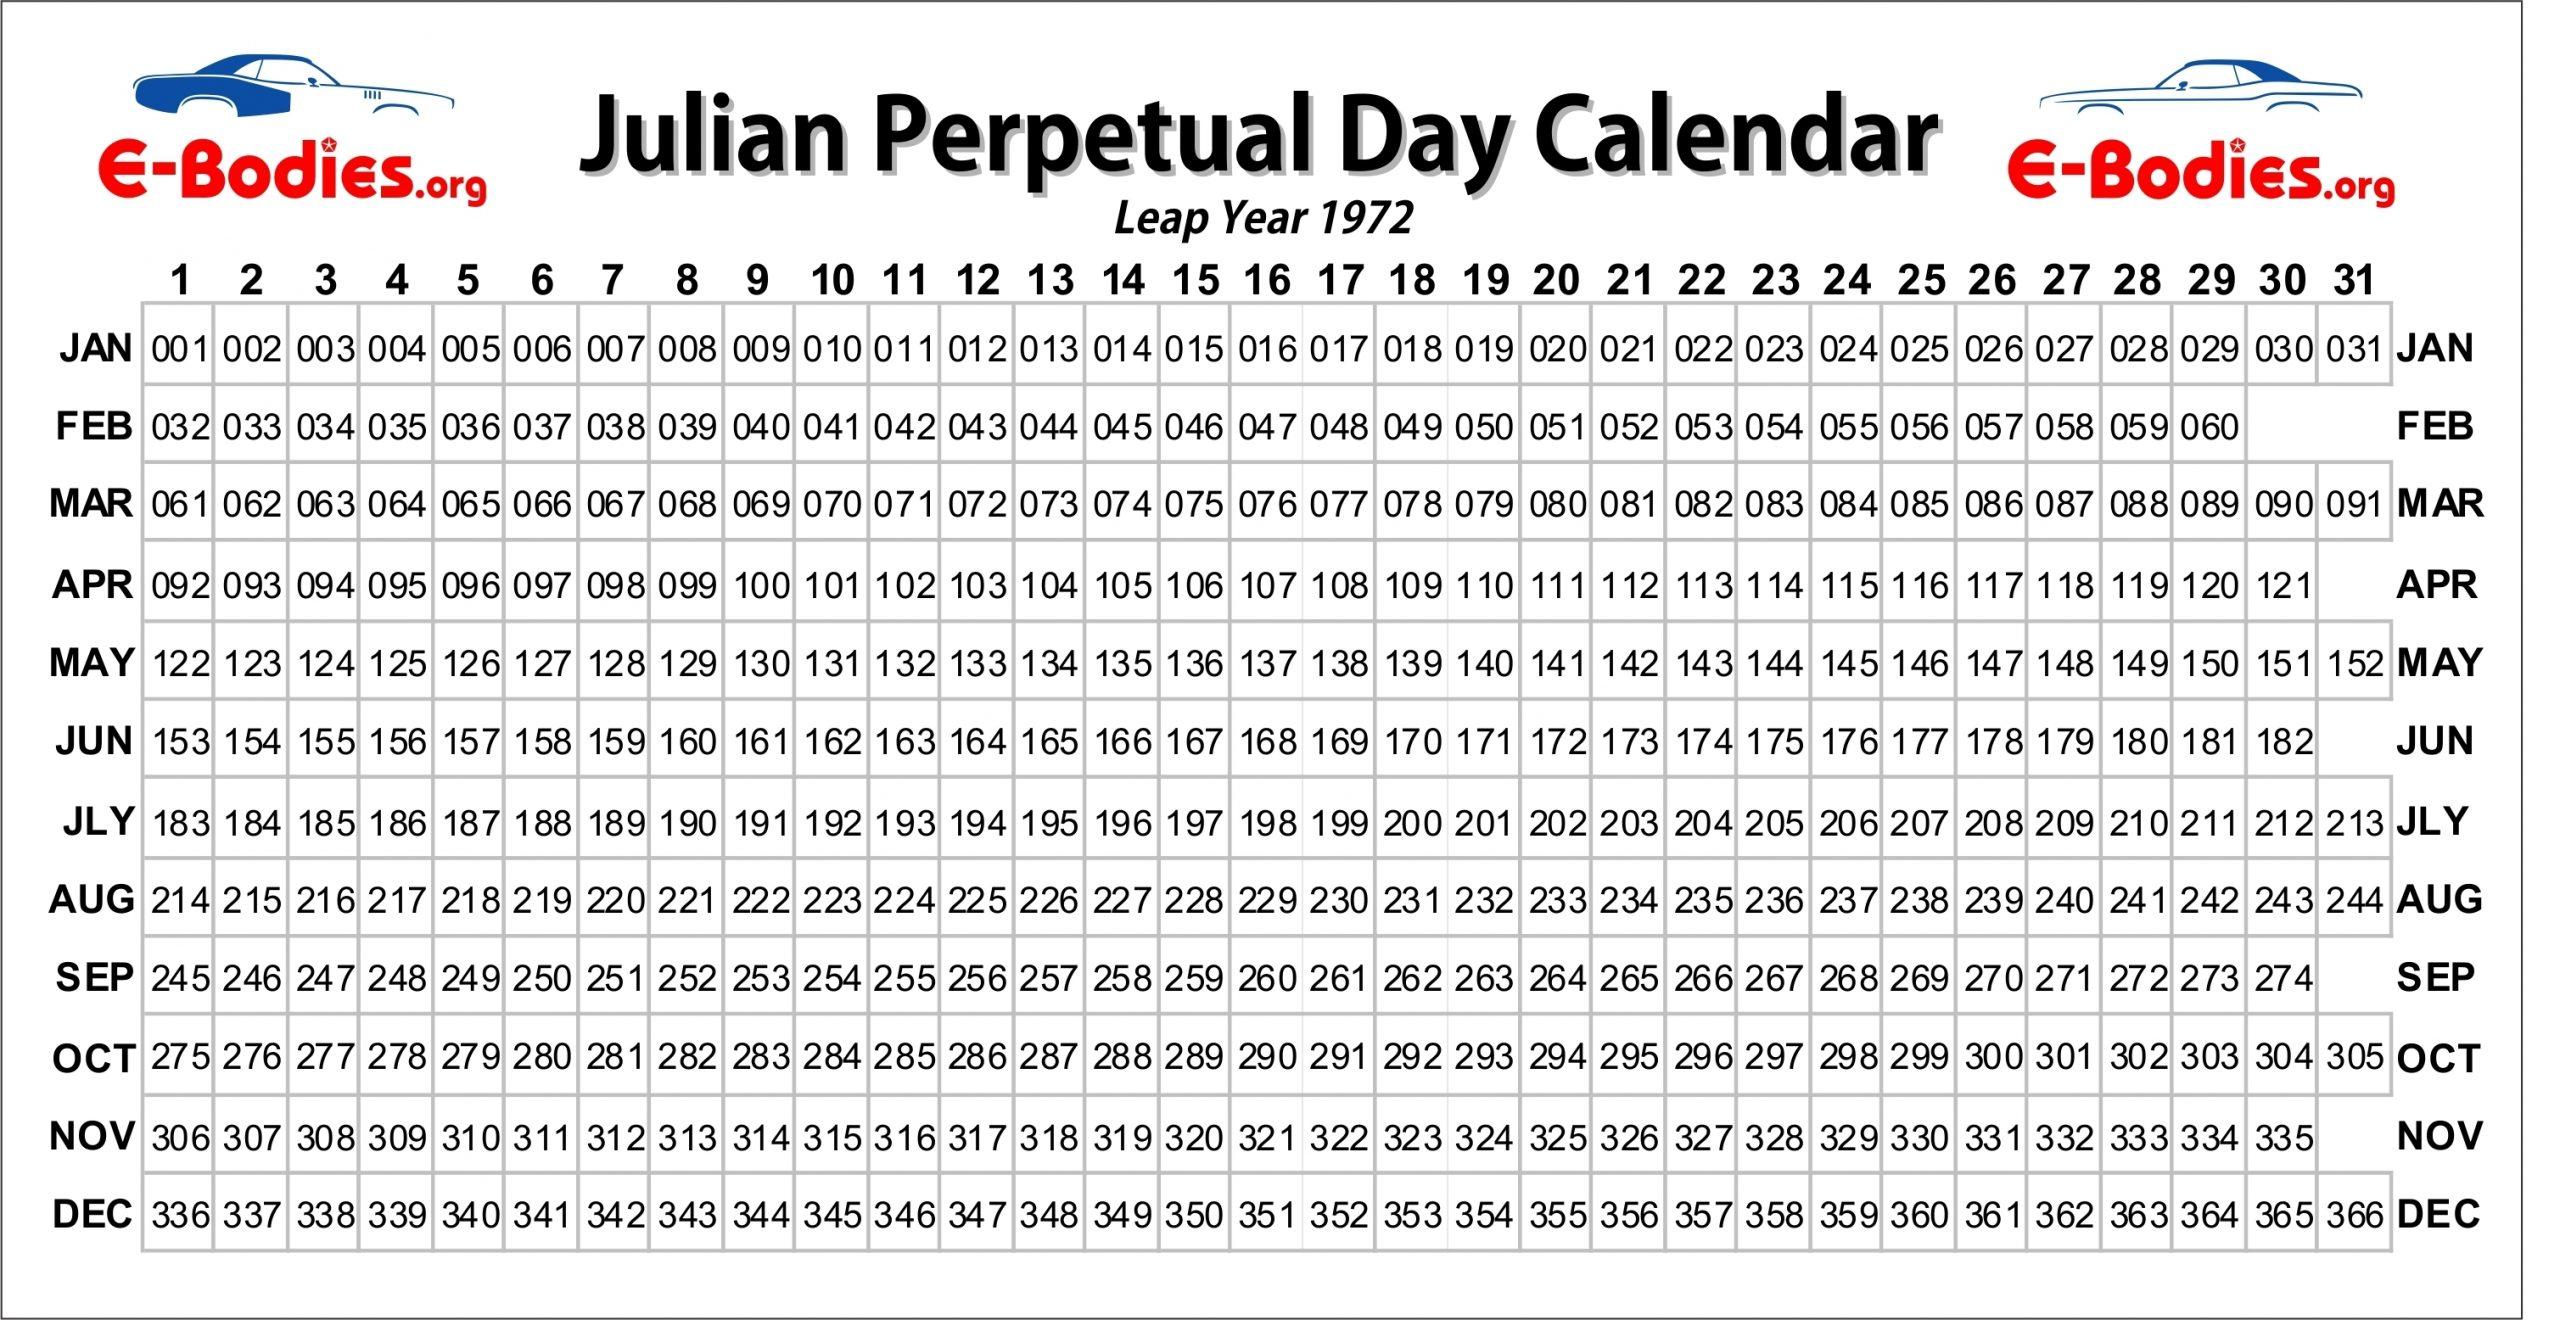 Mopar Julian Perpetual Day Calendar Leap Year – E-Bodies